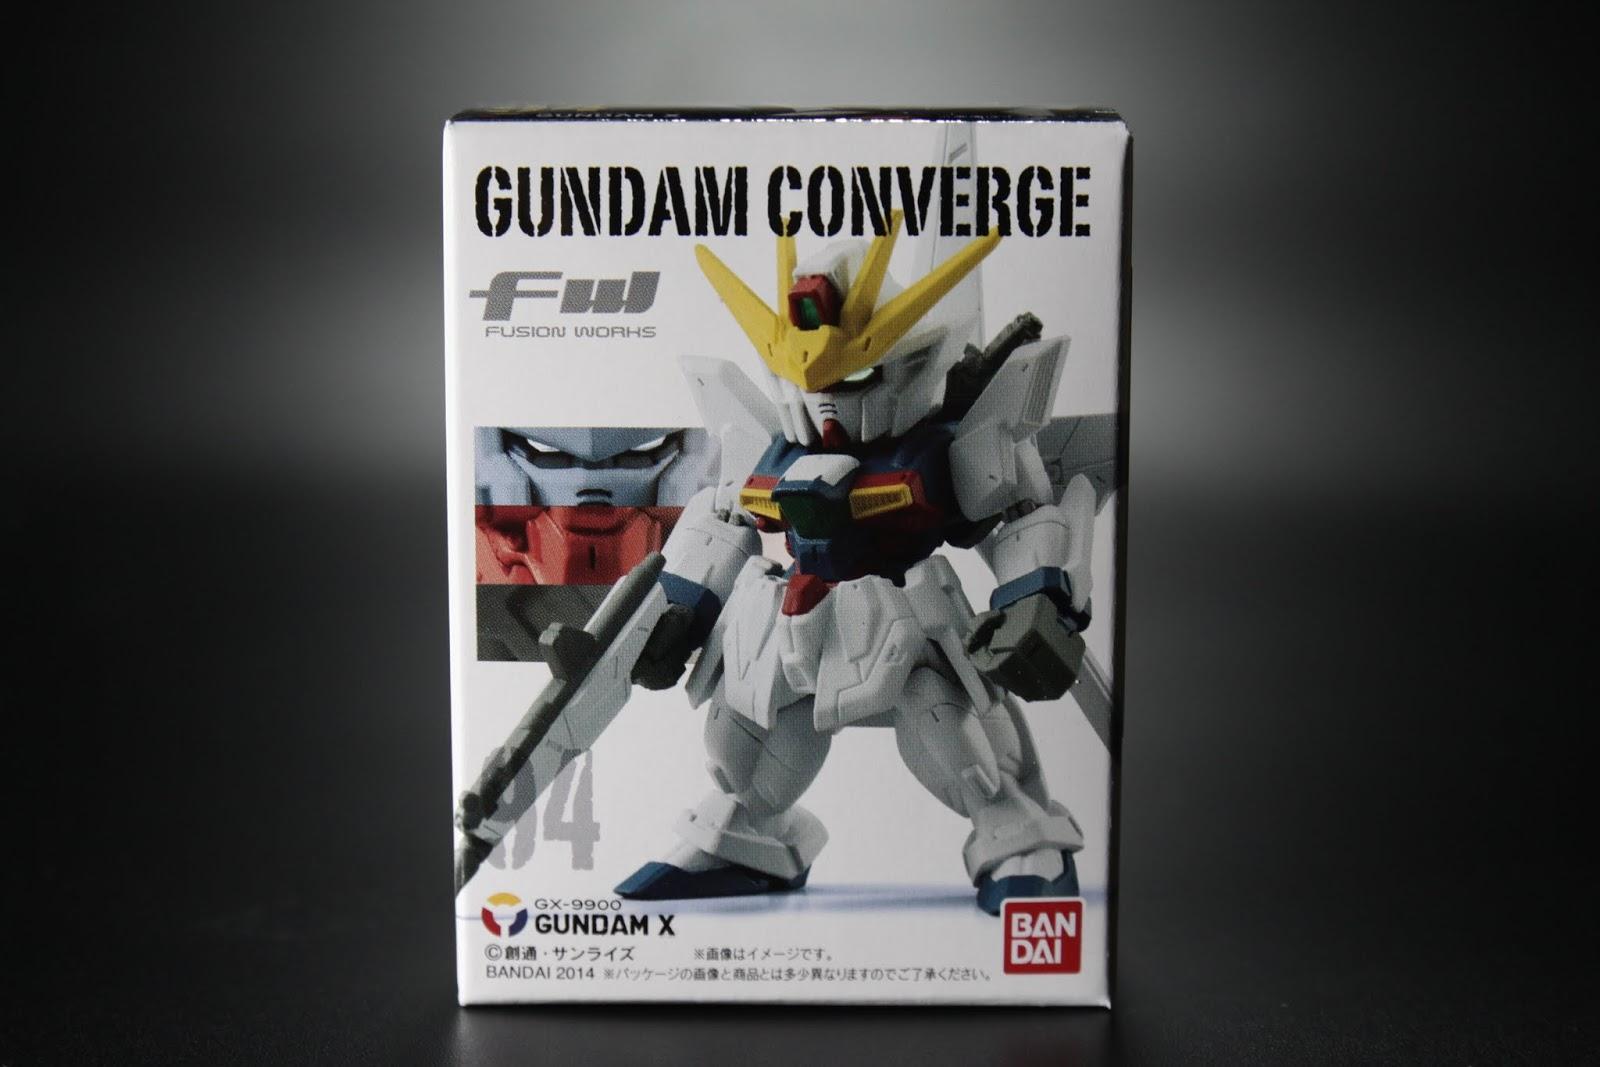 Gundam X Gundam X的初期主役機